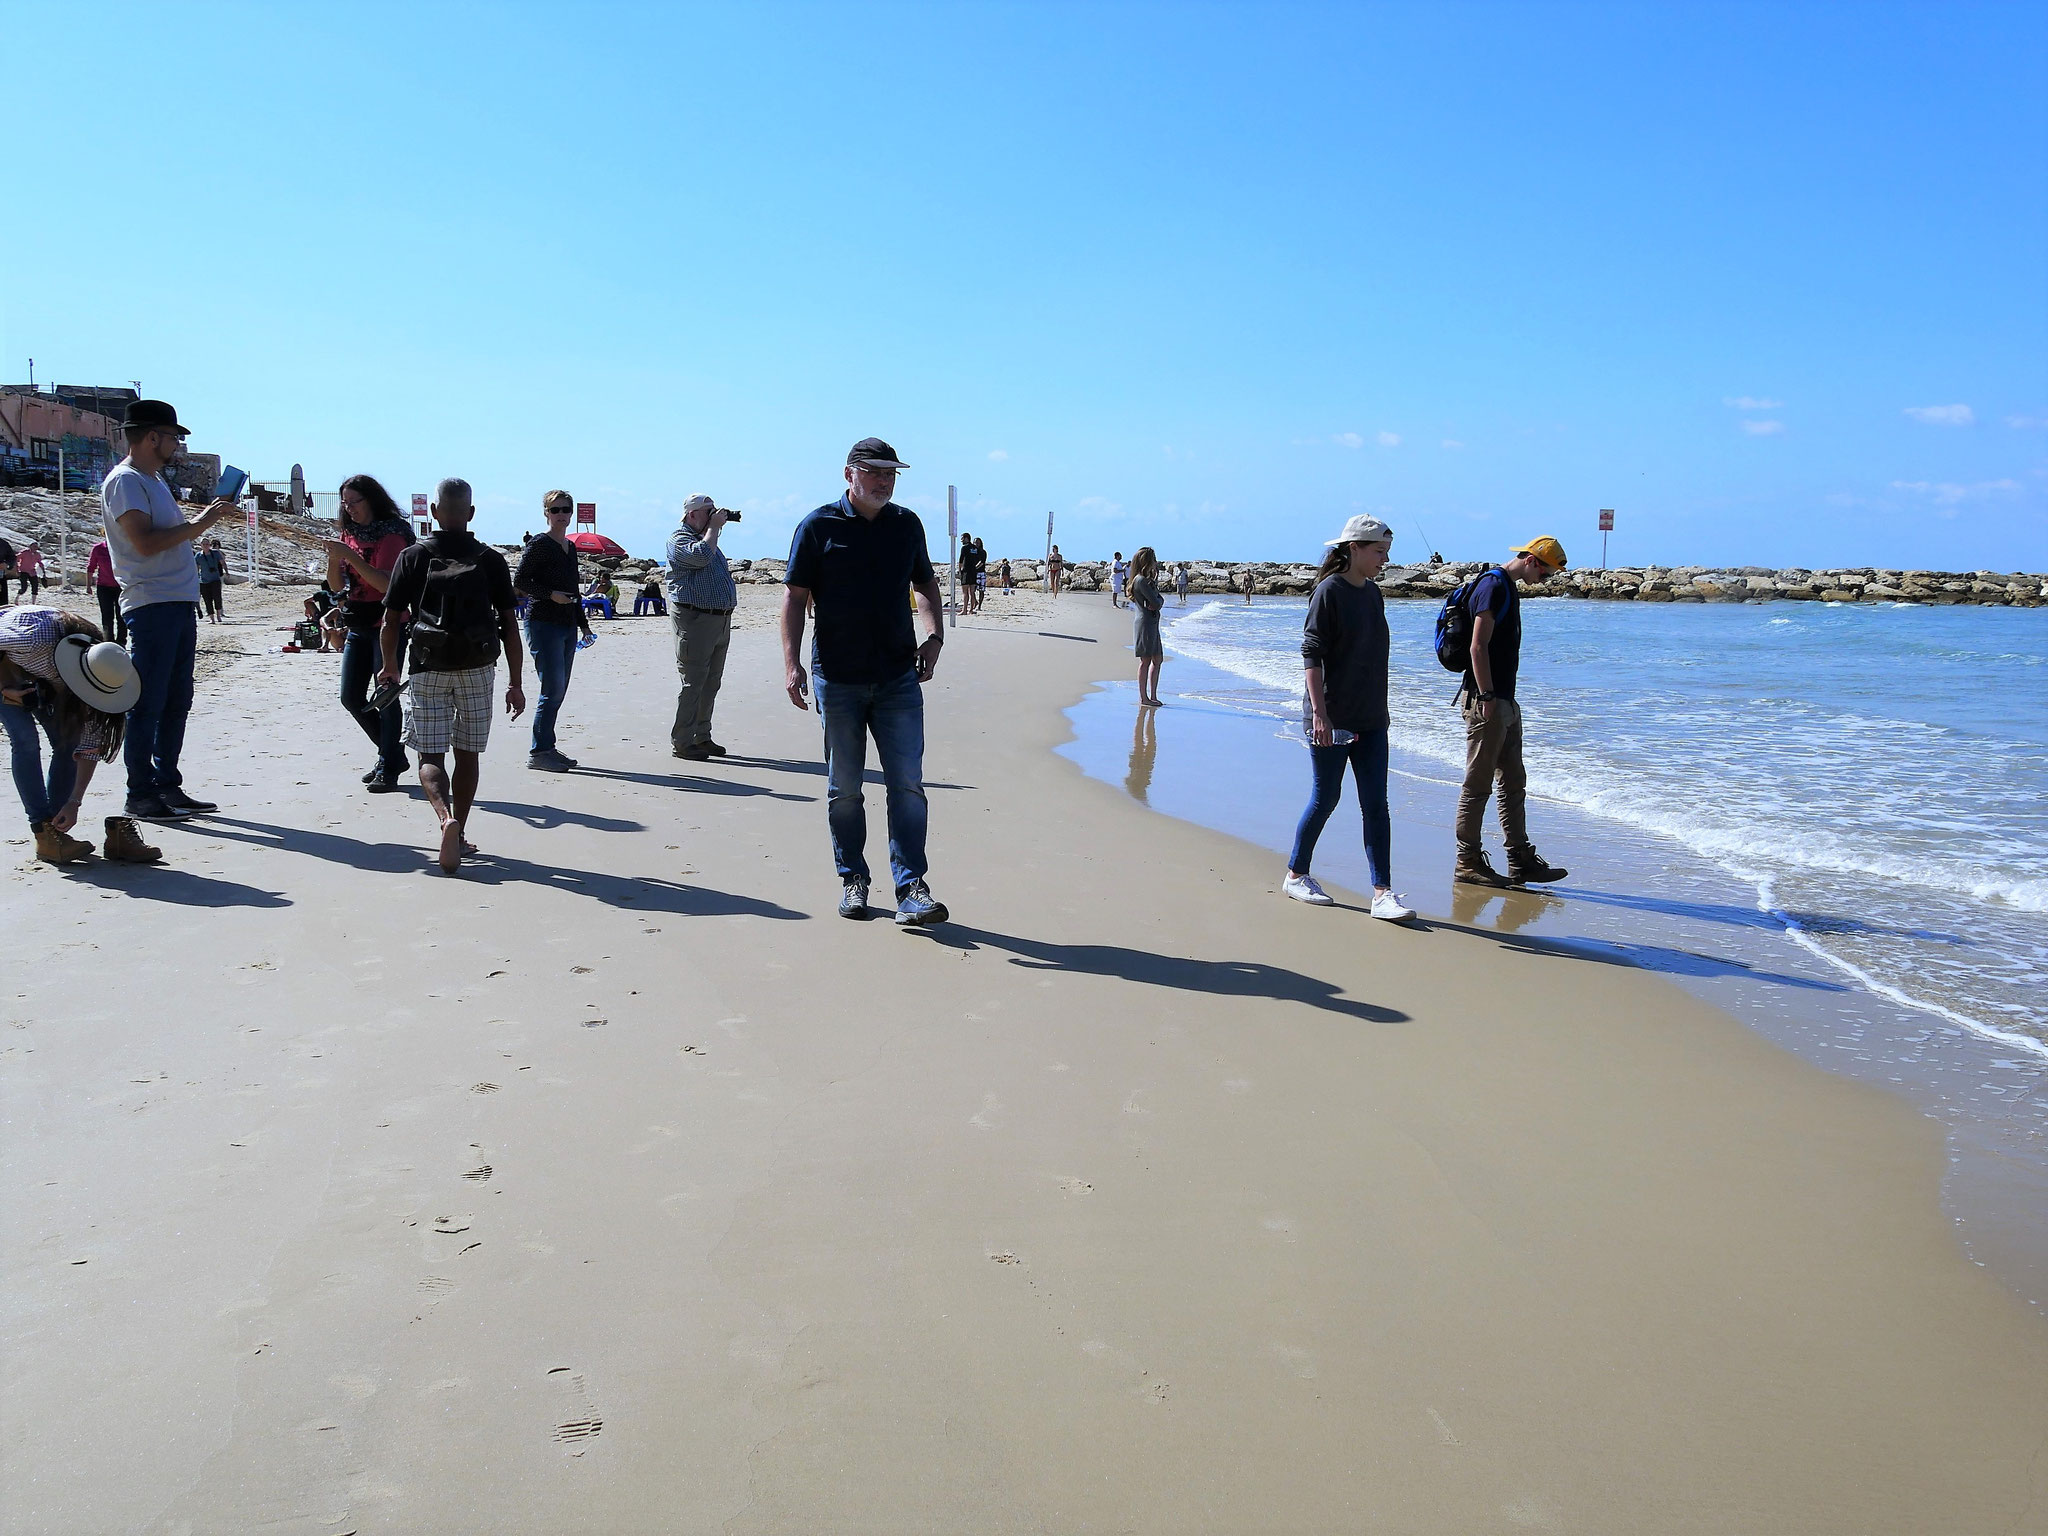 Tel Aviv - Strandspziergang am Mittelmeer